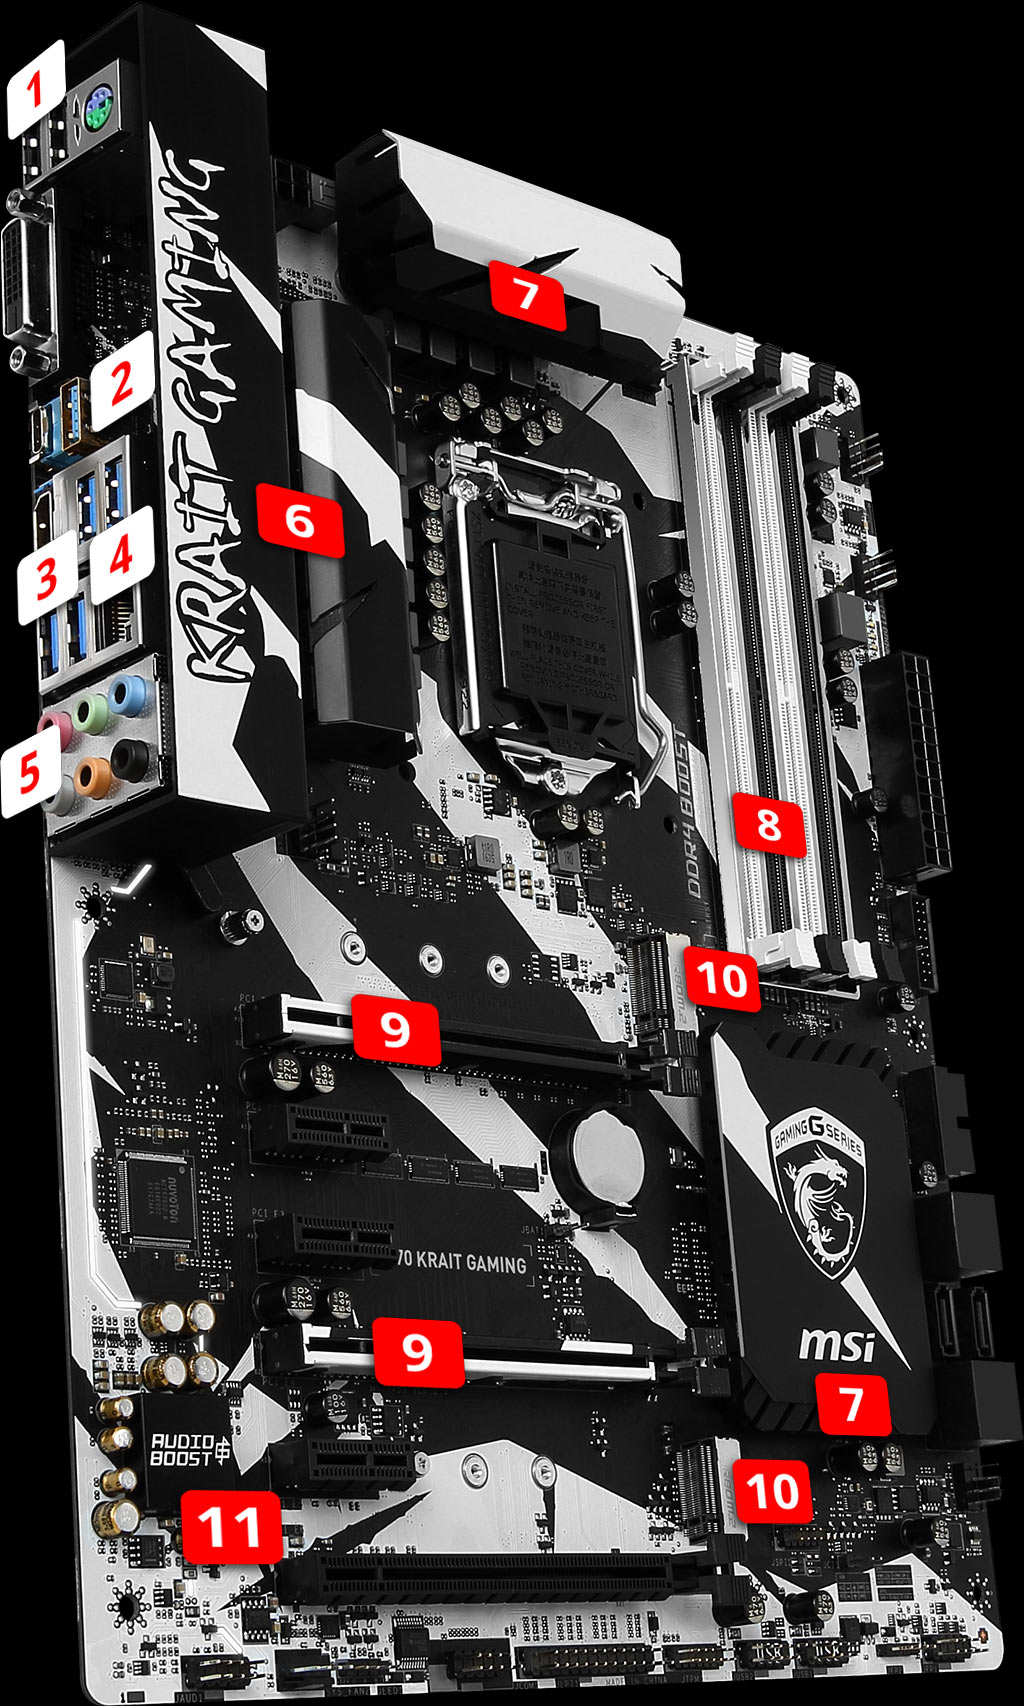 Image Result For Z Krait Gaming Motherboard The World Leader In